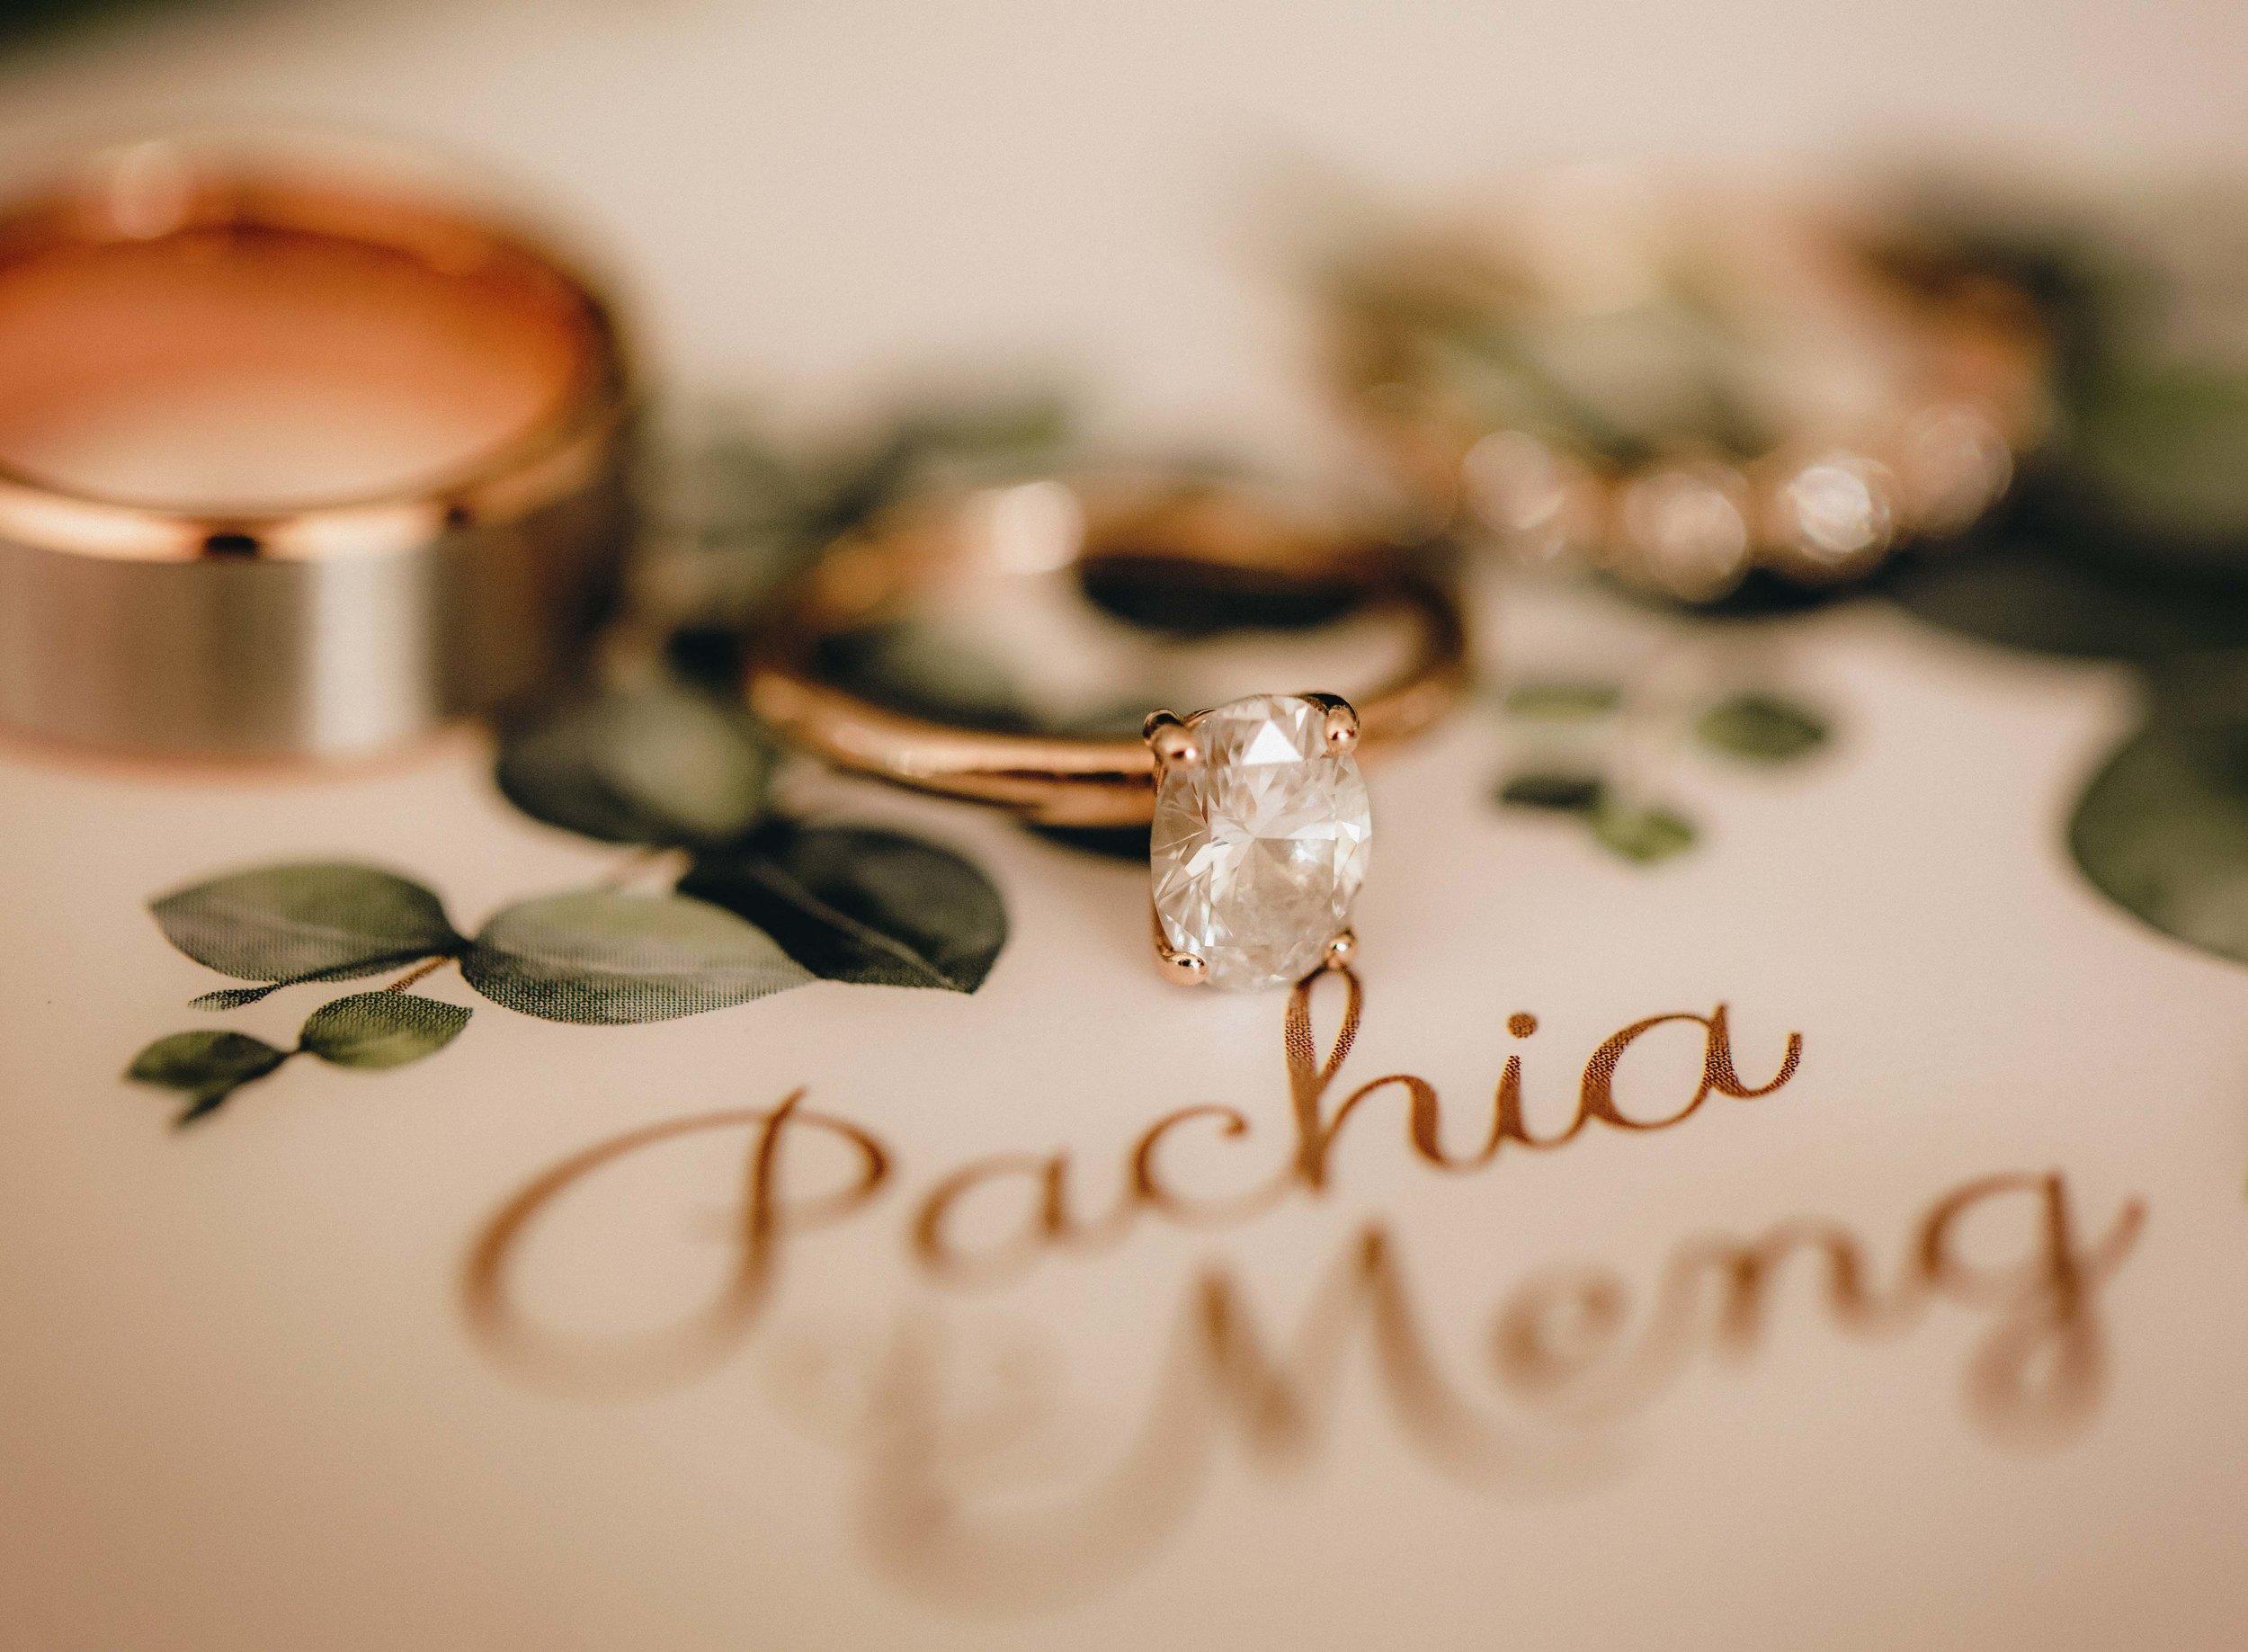 Pachia + Meng, Part IV, Let's Celebrate!-14.jpg